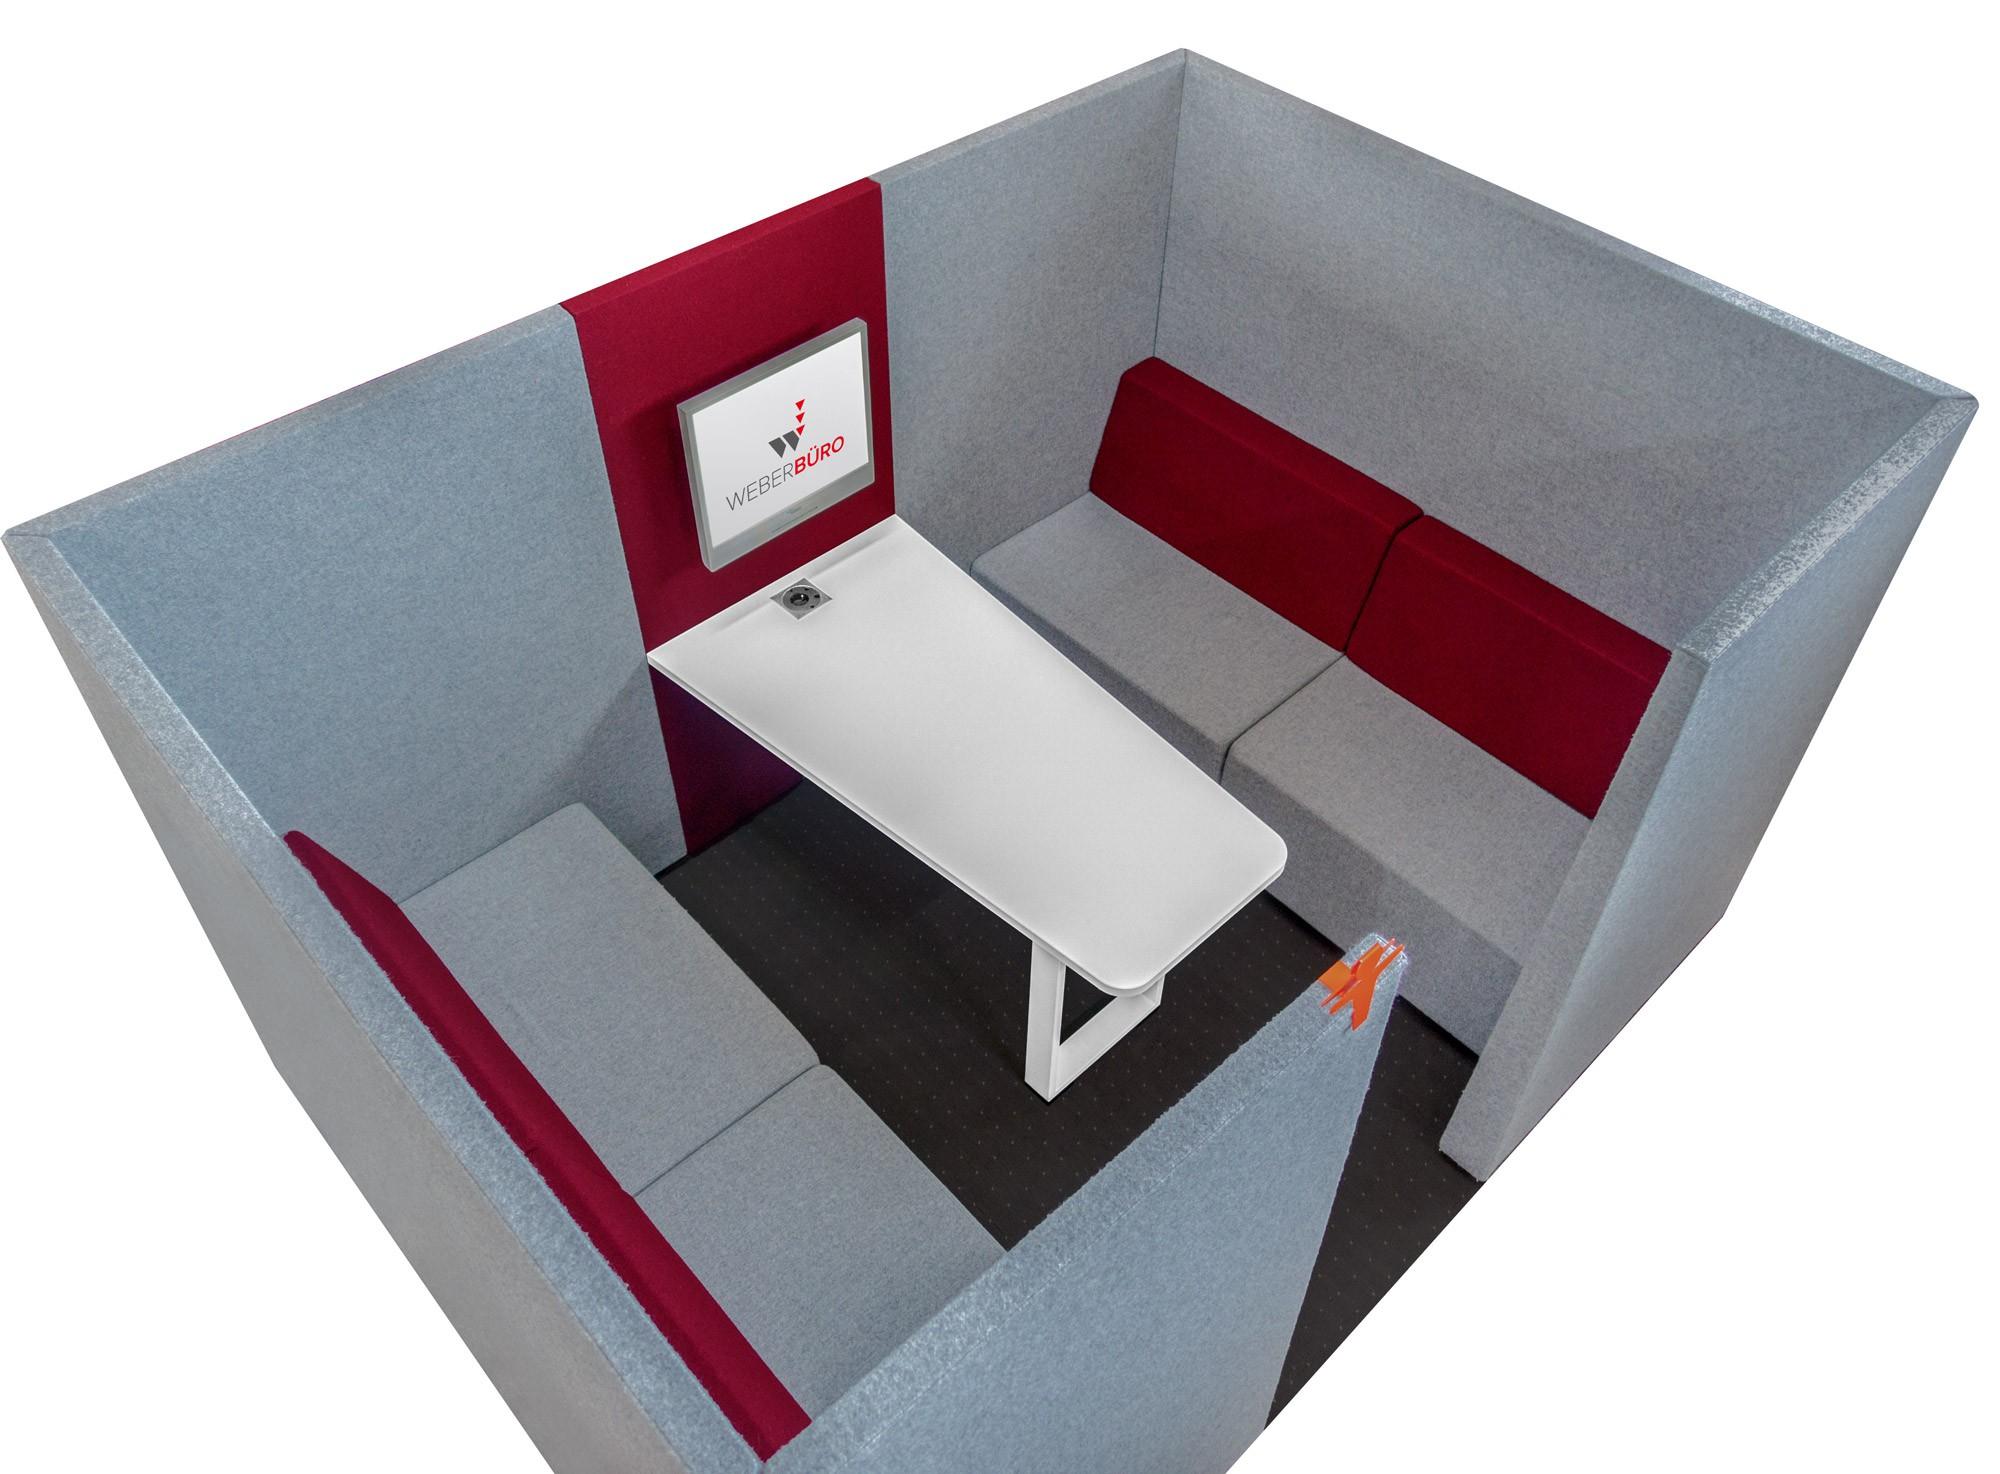 SilentBox JAZZ Besprechungsinsel, Ruhezone, Akustik-Schallschutz, Schallabsorber